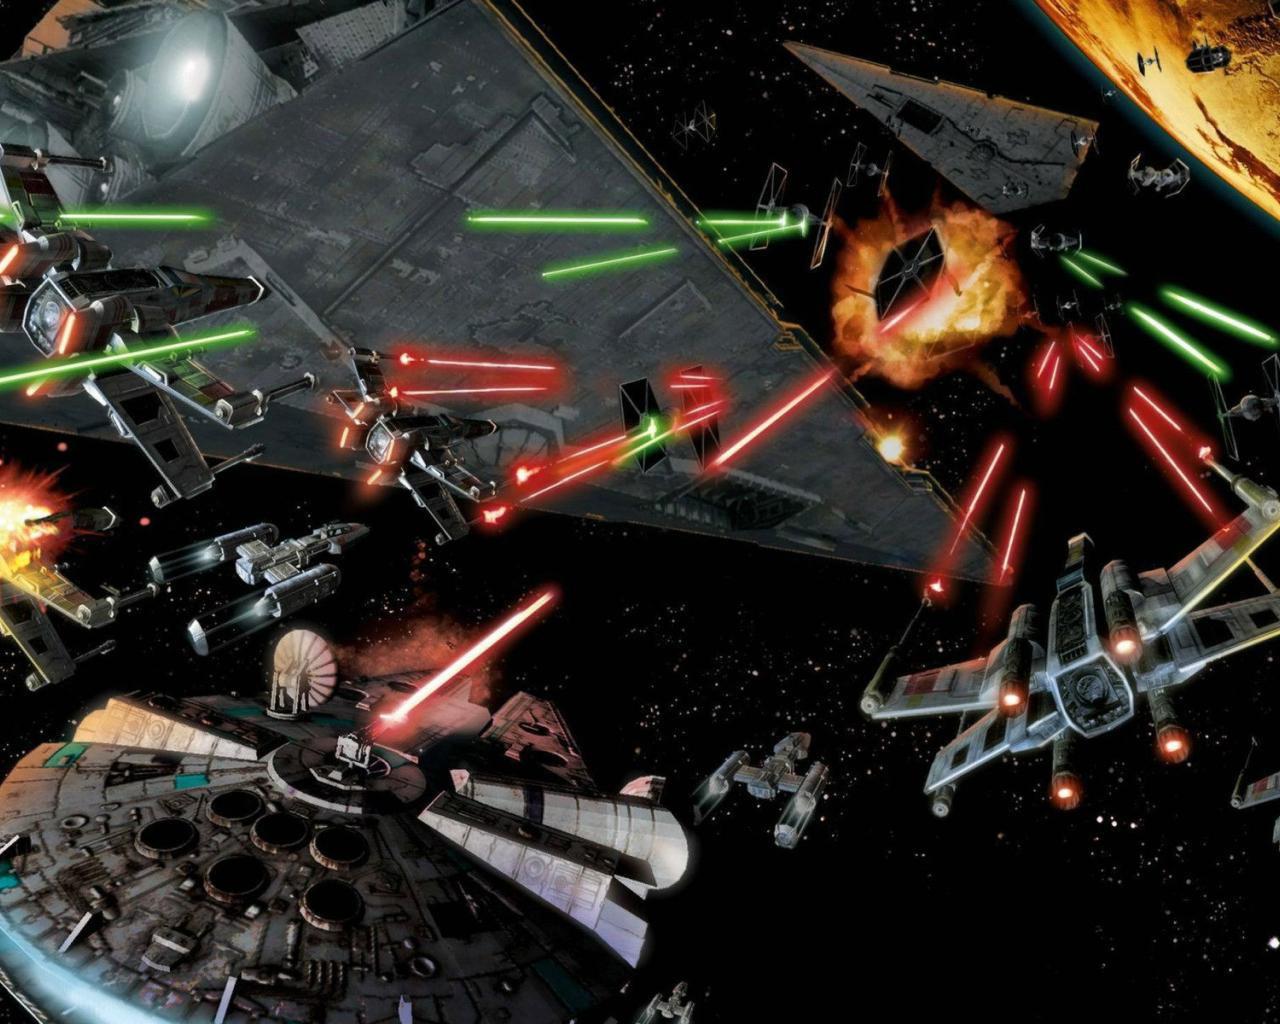 Free Download The Hunter Wars Star Wars Delta Squad Wiki Fandom Powered By Wikia 1920x1200 For Your Desktop Mobile Tablet Explore 53 Star Wars Battle Background Star Wars Battle